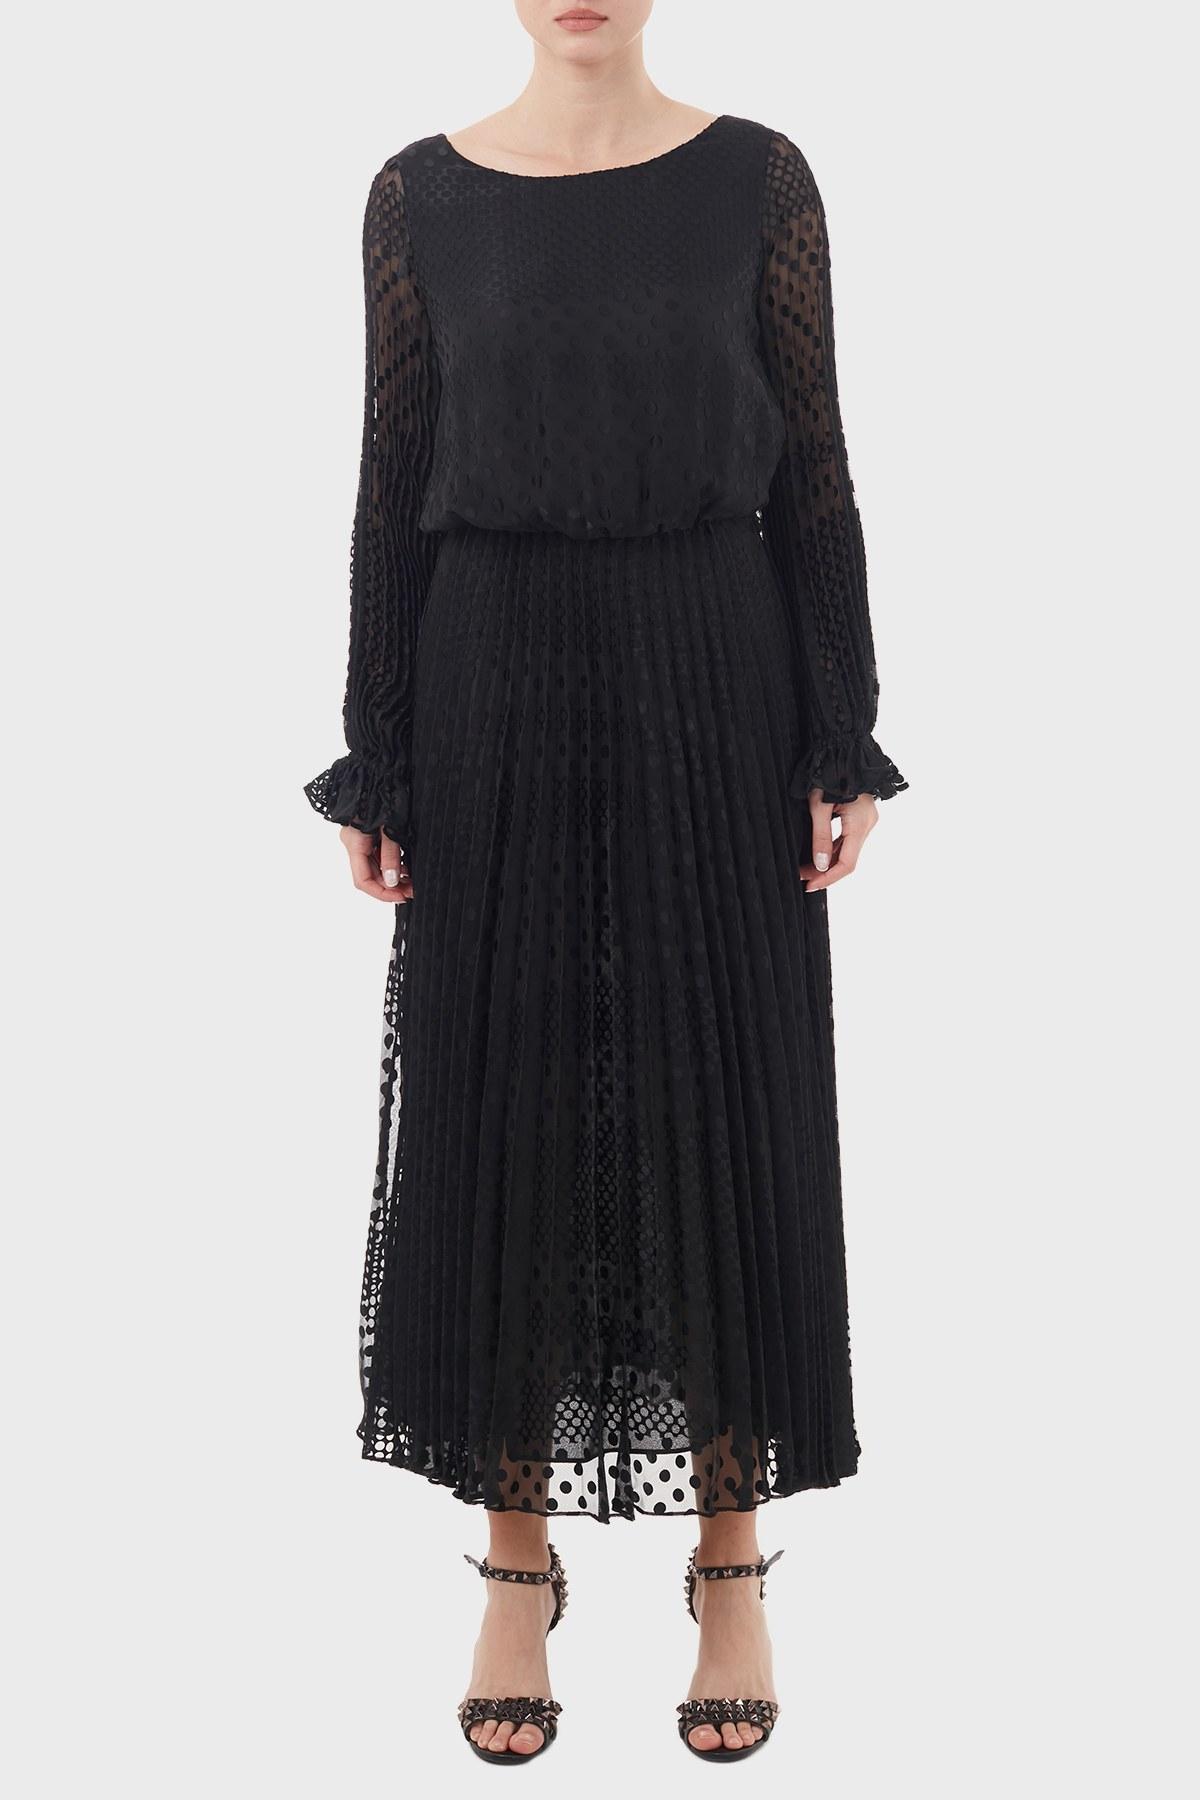 Emporio Armani Tül Detaylı Piliseli Bayan Elbise 6H2A80 2NMBZ 0999 SİYAH